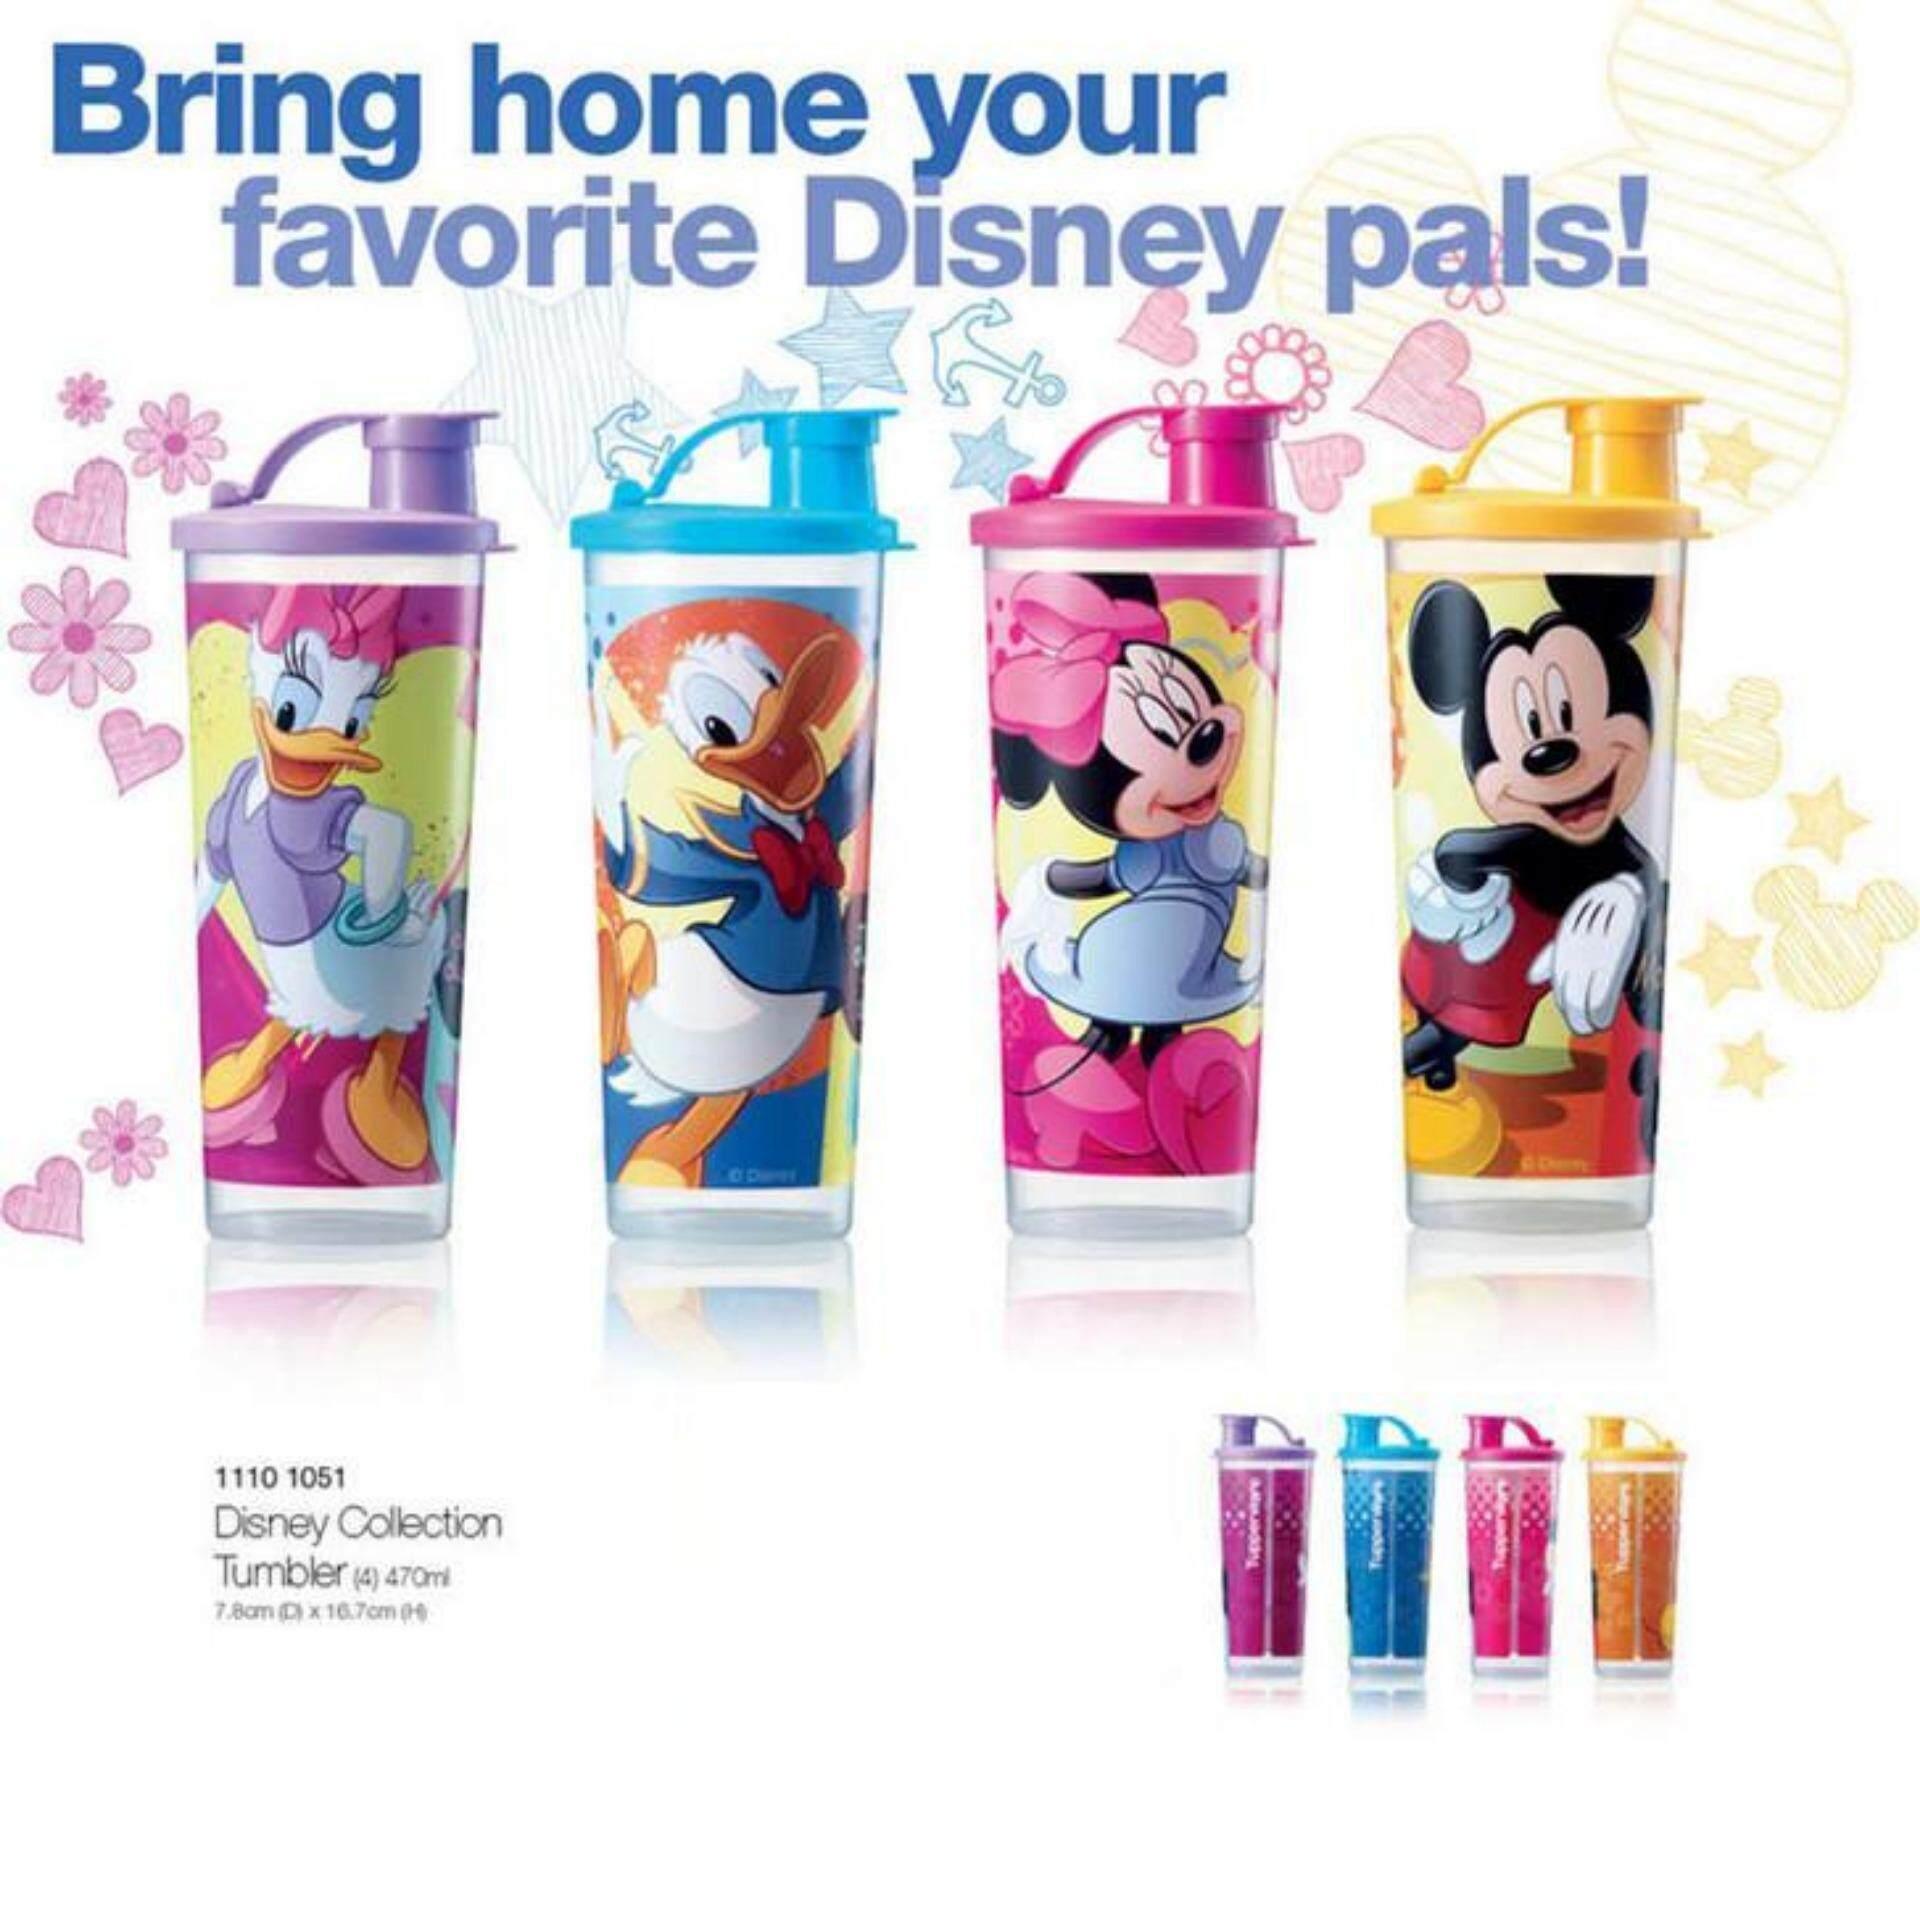 Eunice Fashionshop Thermos Flask Buy Online Eco 310ml 4 Neon Bottle Tupperware Disney Collection Tumbler 1 470ml Random Send Design